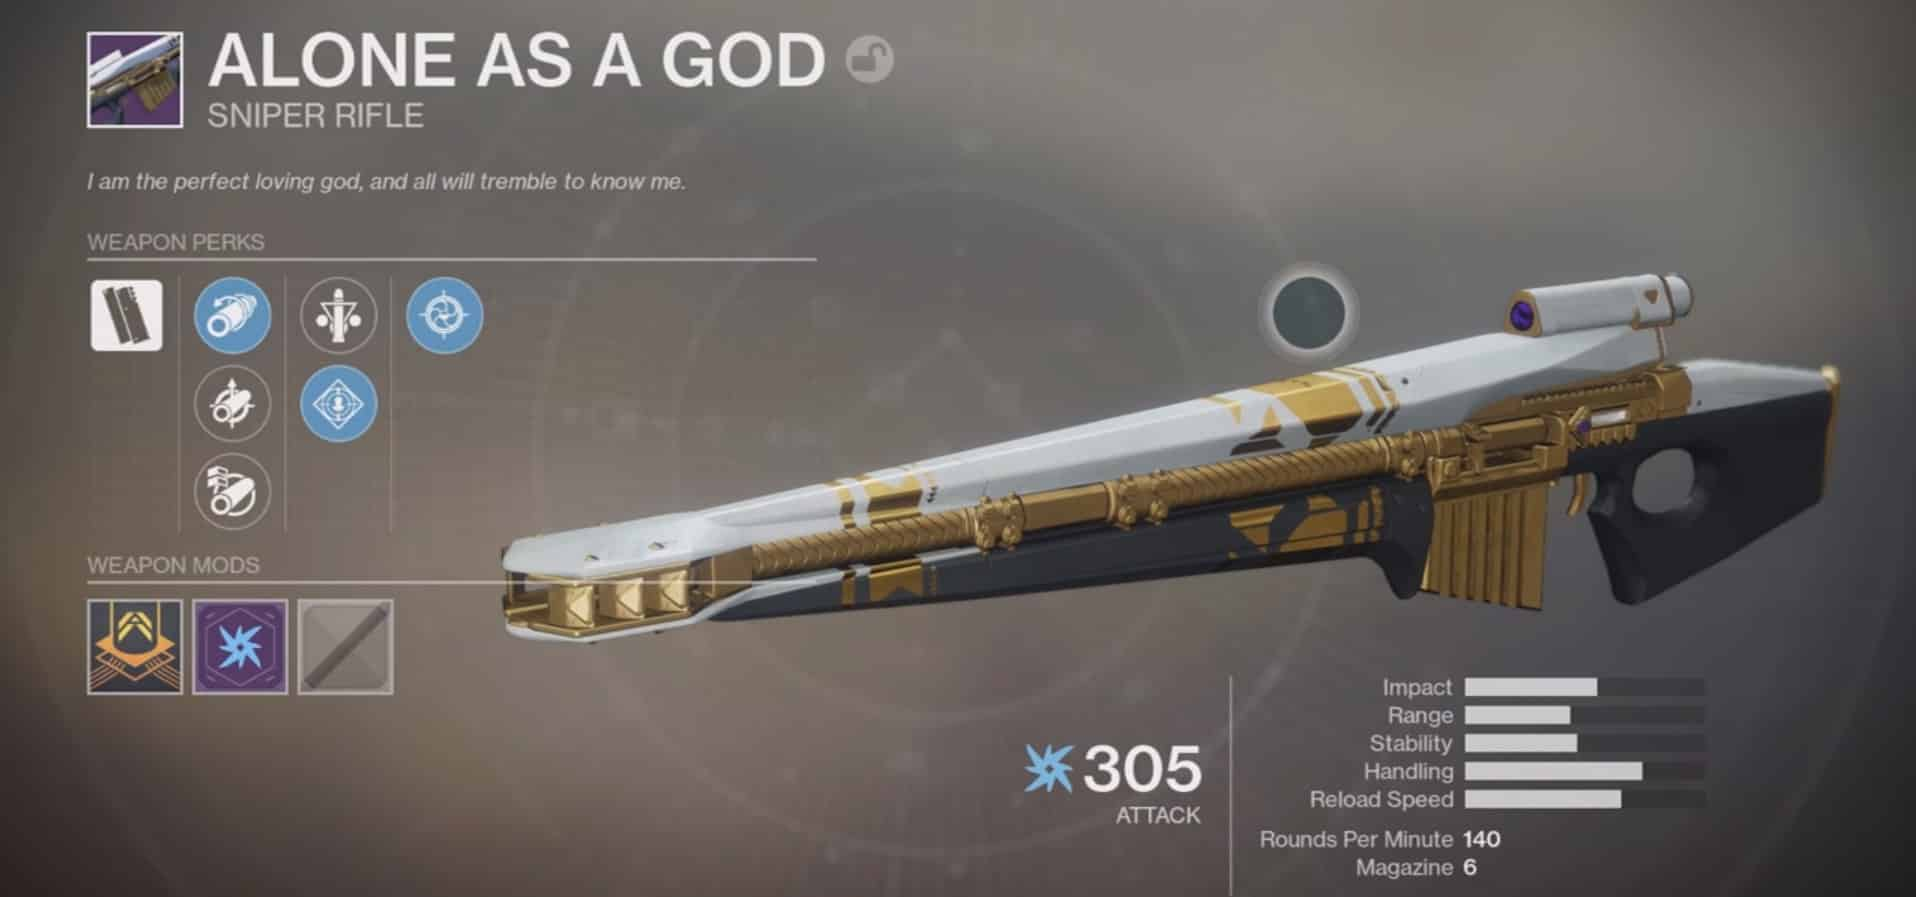 alone as a god leviathan raid new legendary sniper